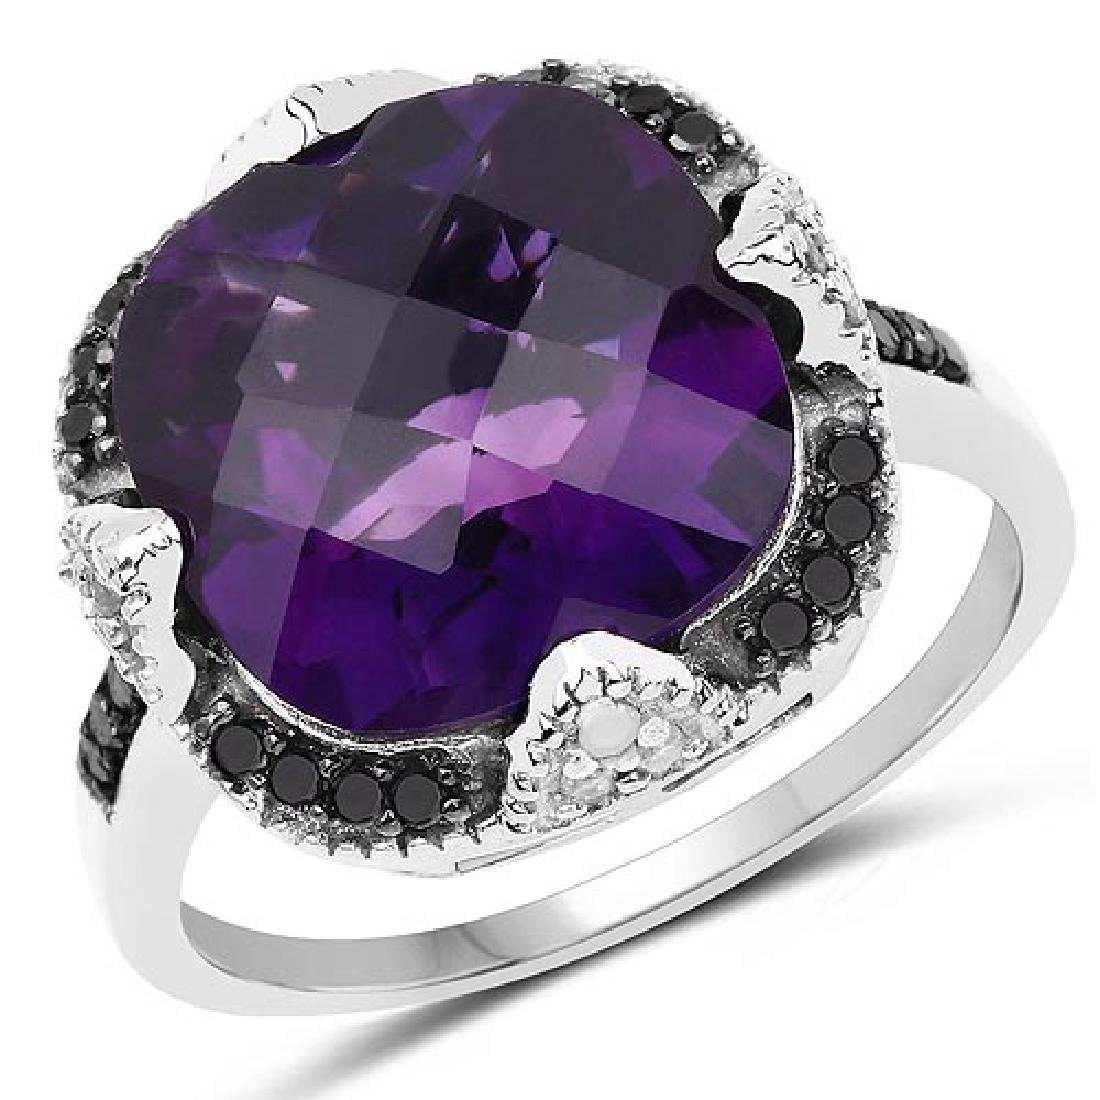 6.12 Carat Genuine Amethyst Black Diamond and White Di